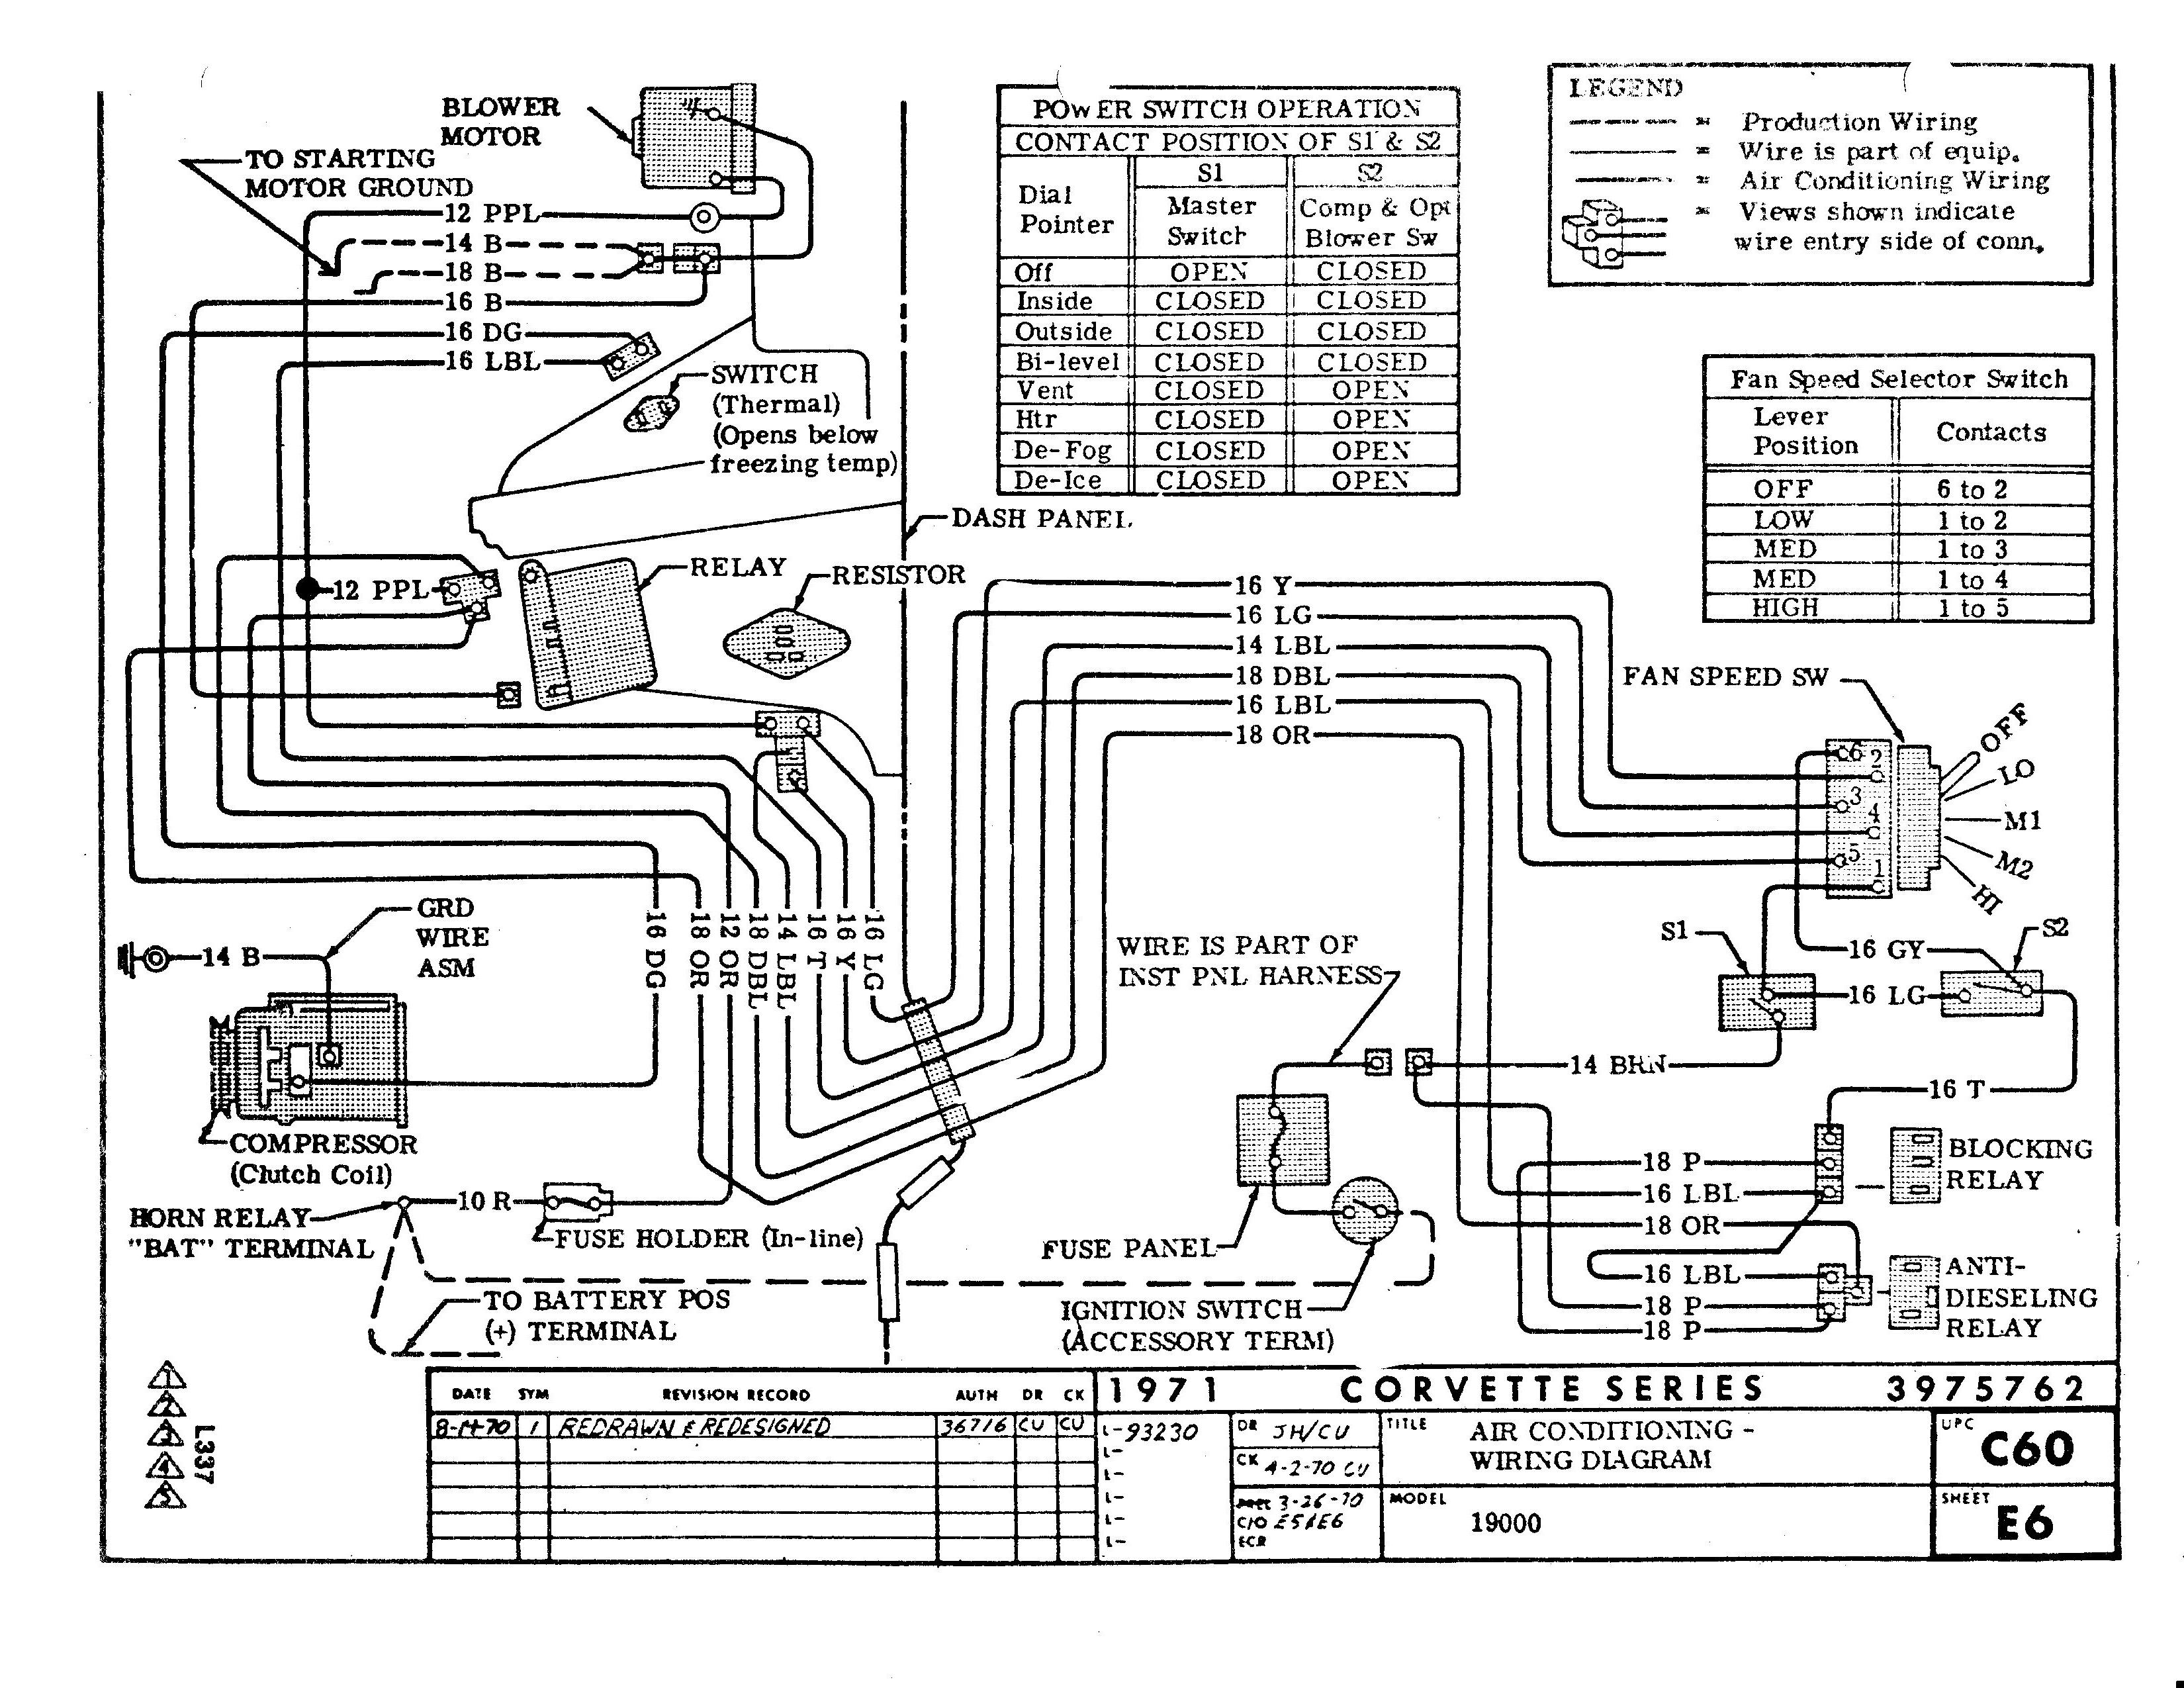 suddenlink wiring diagram